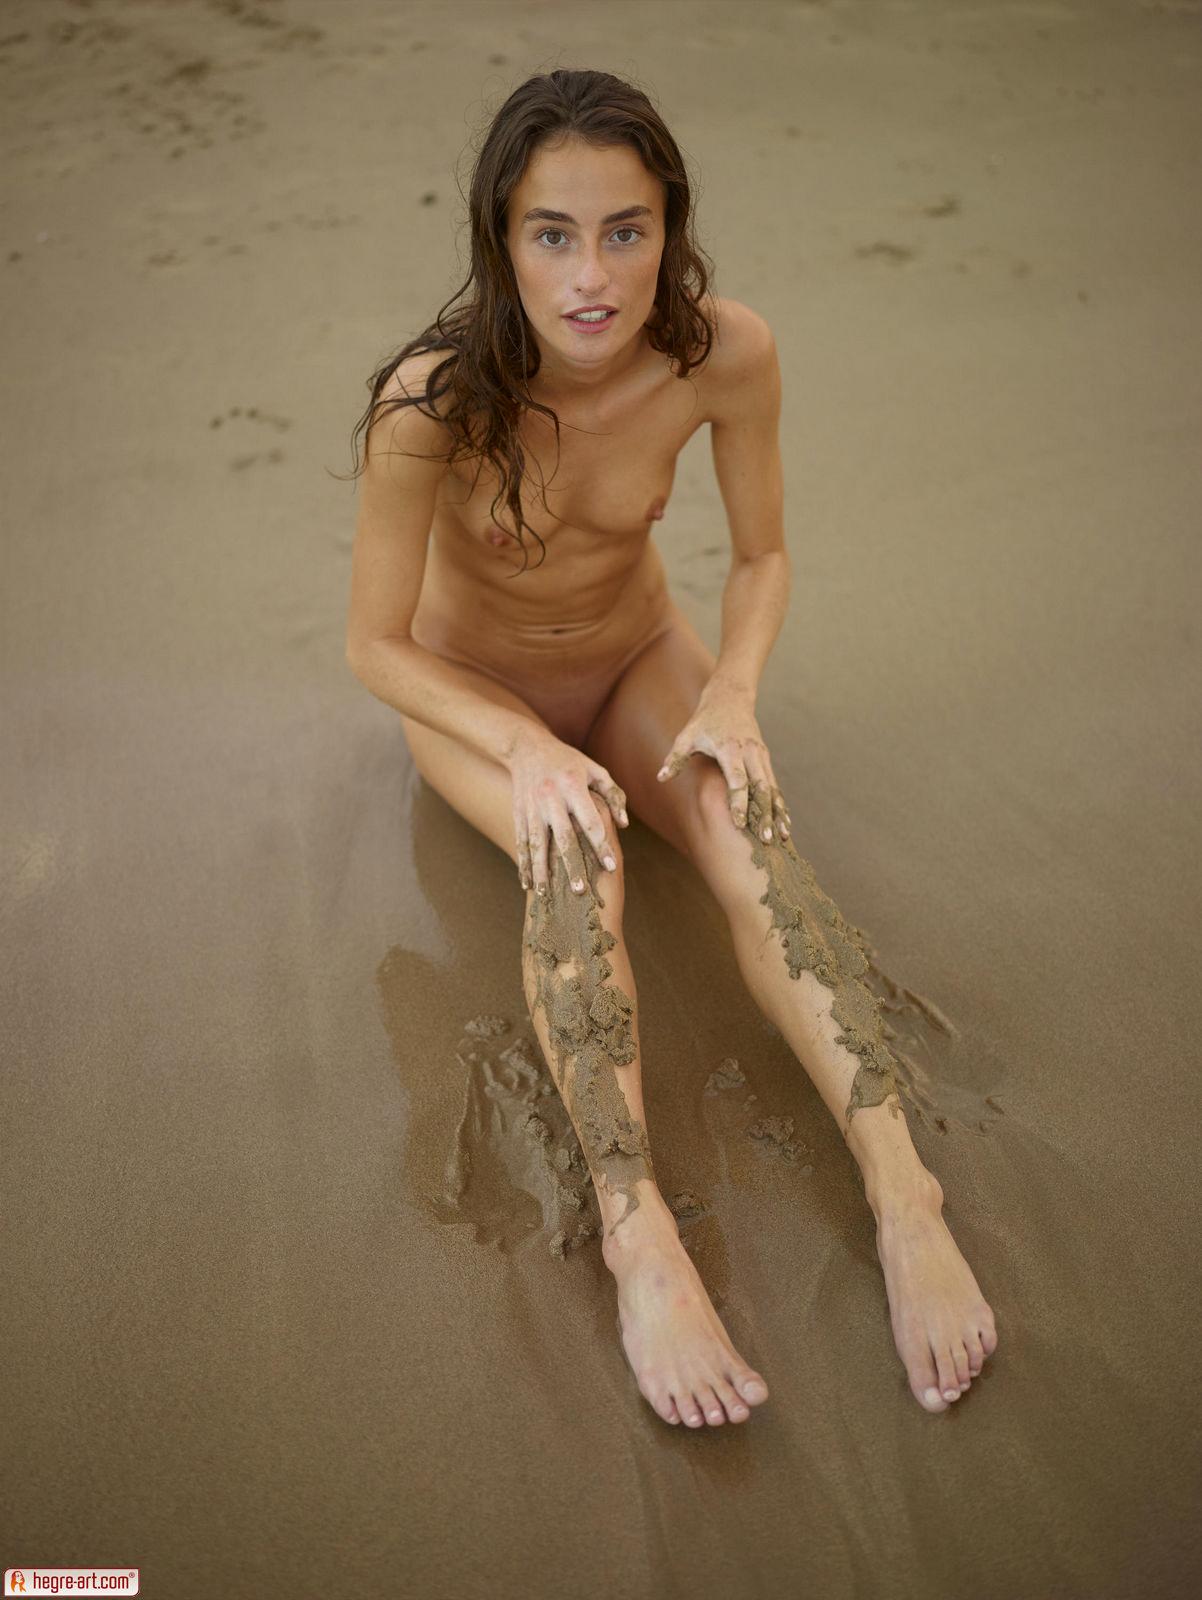 dirty-naked-beach-girls-online-ebony-lesbian